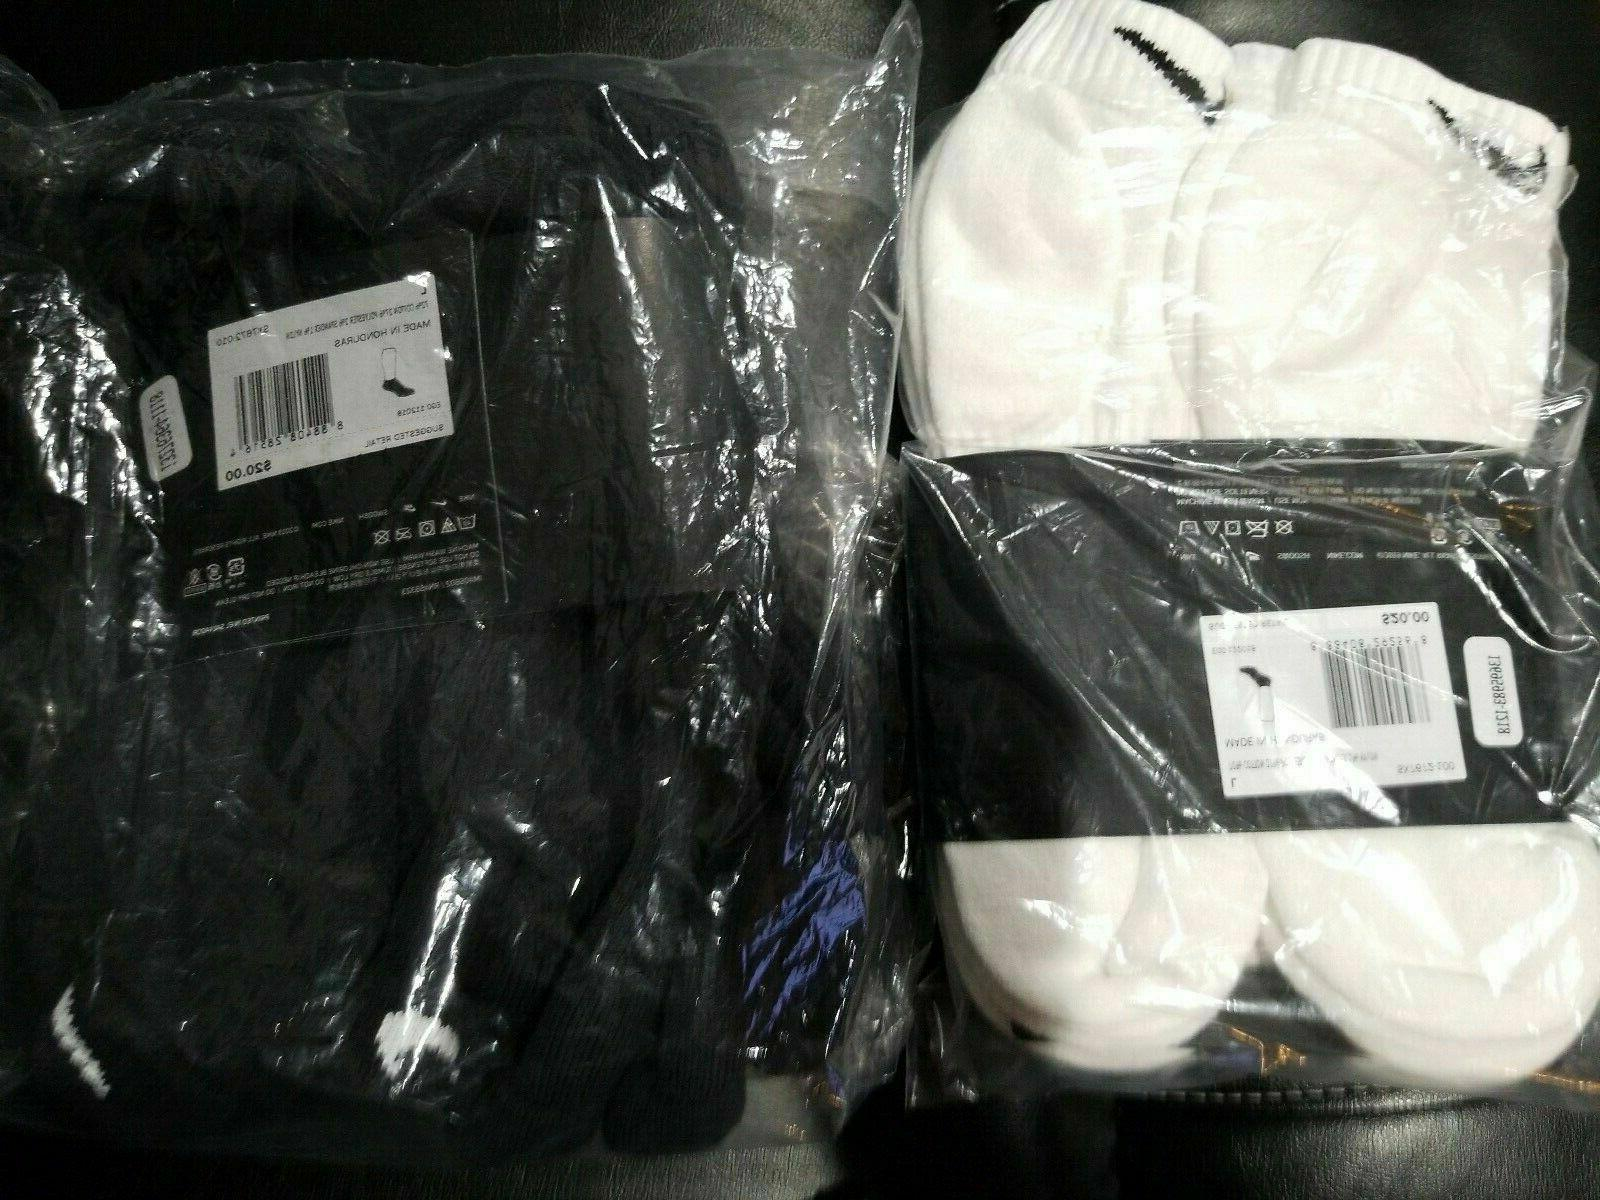 Nike Low Cut Black White Pack Pair